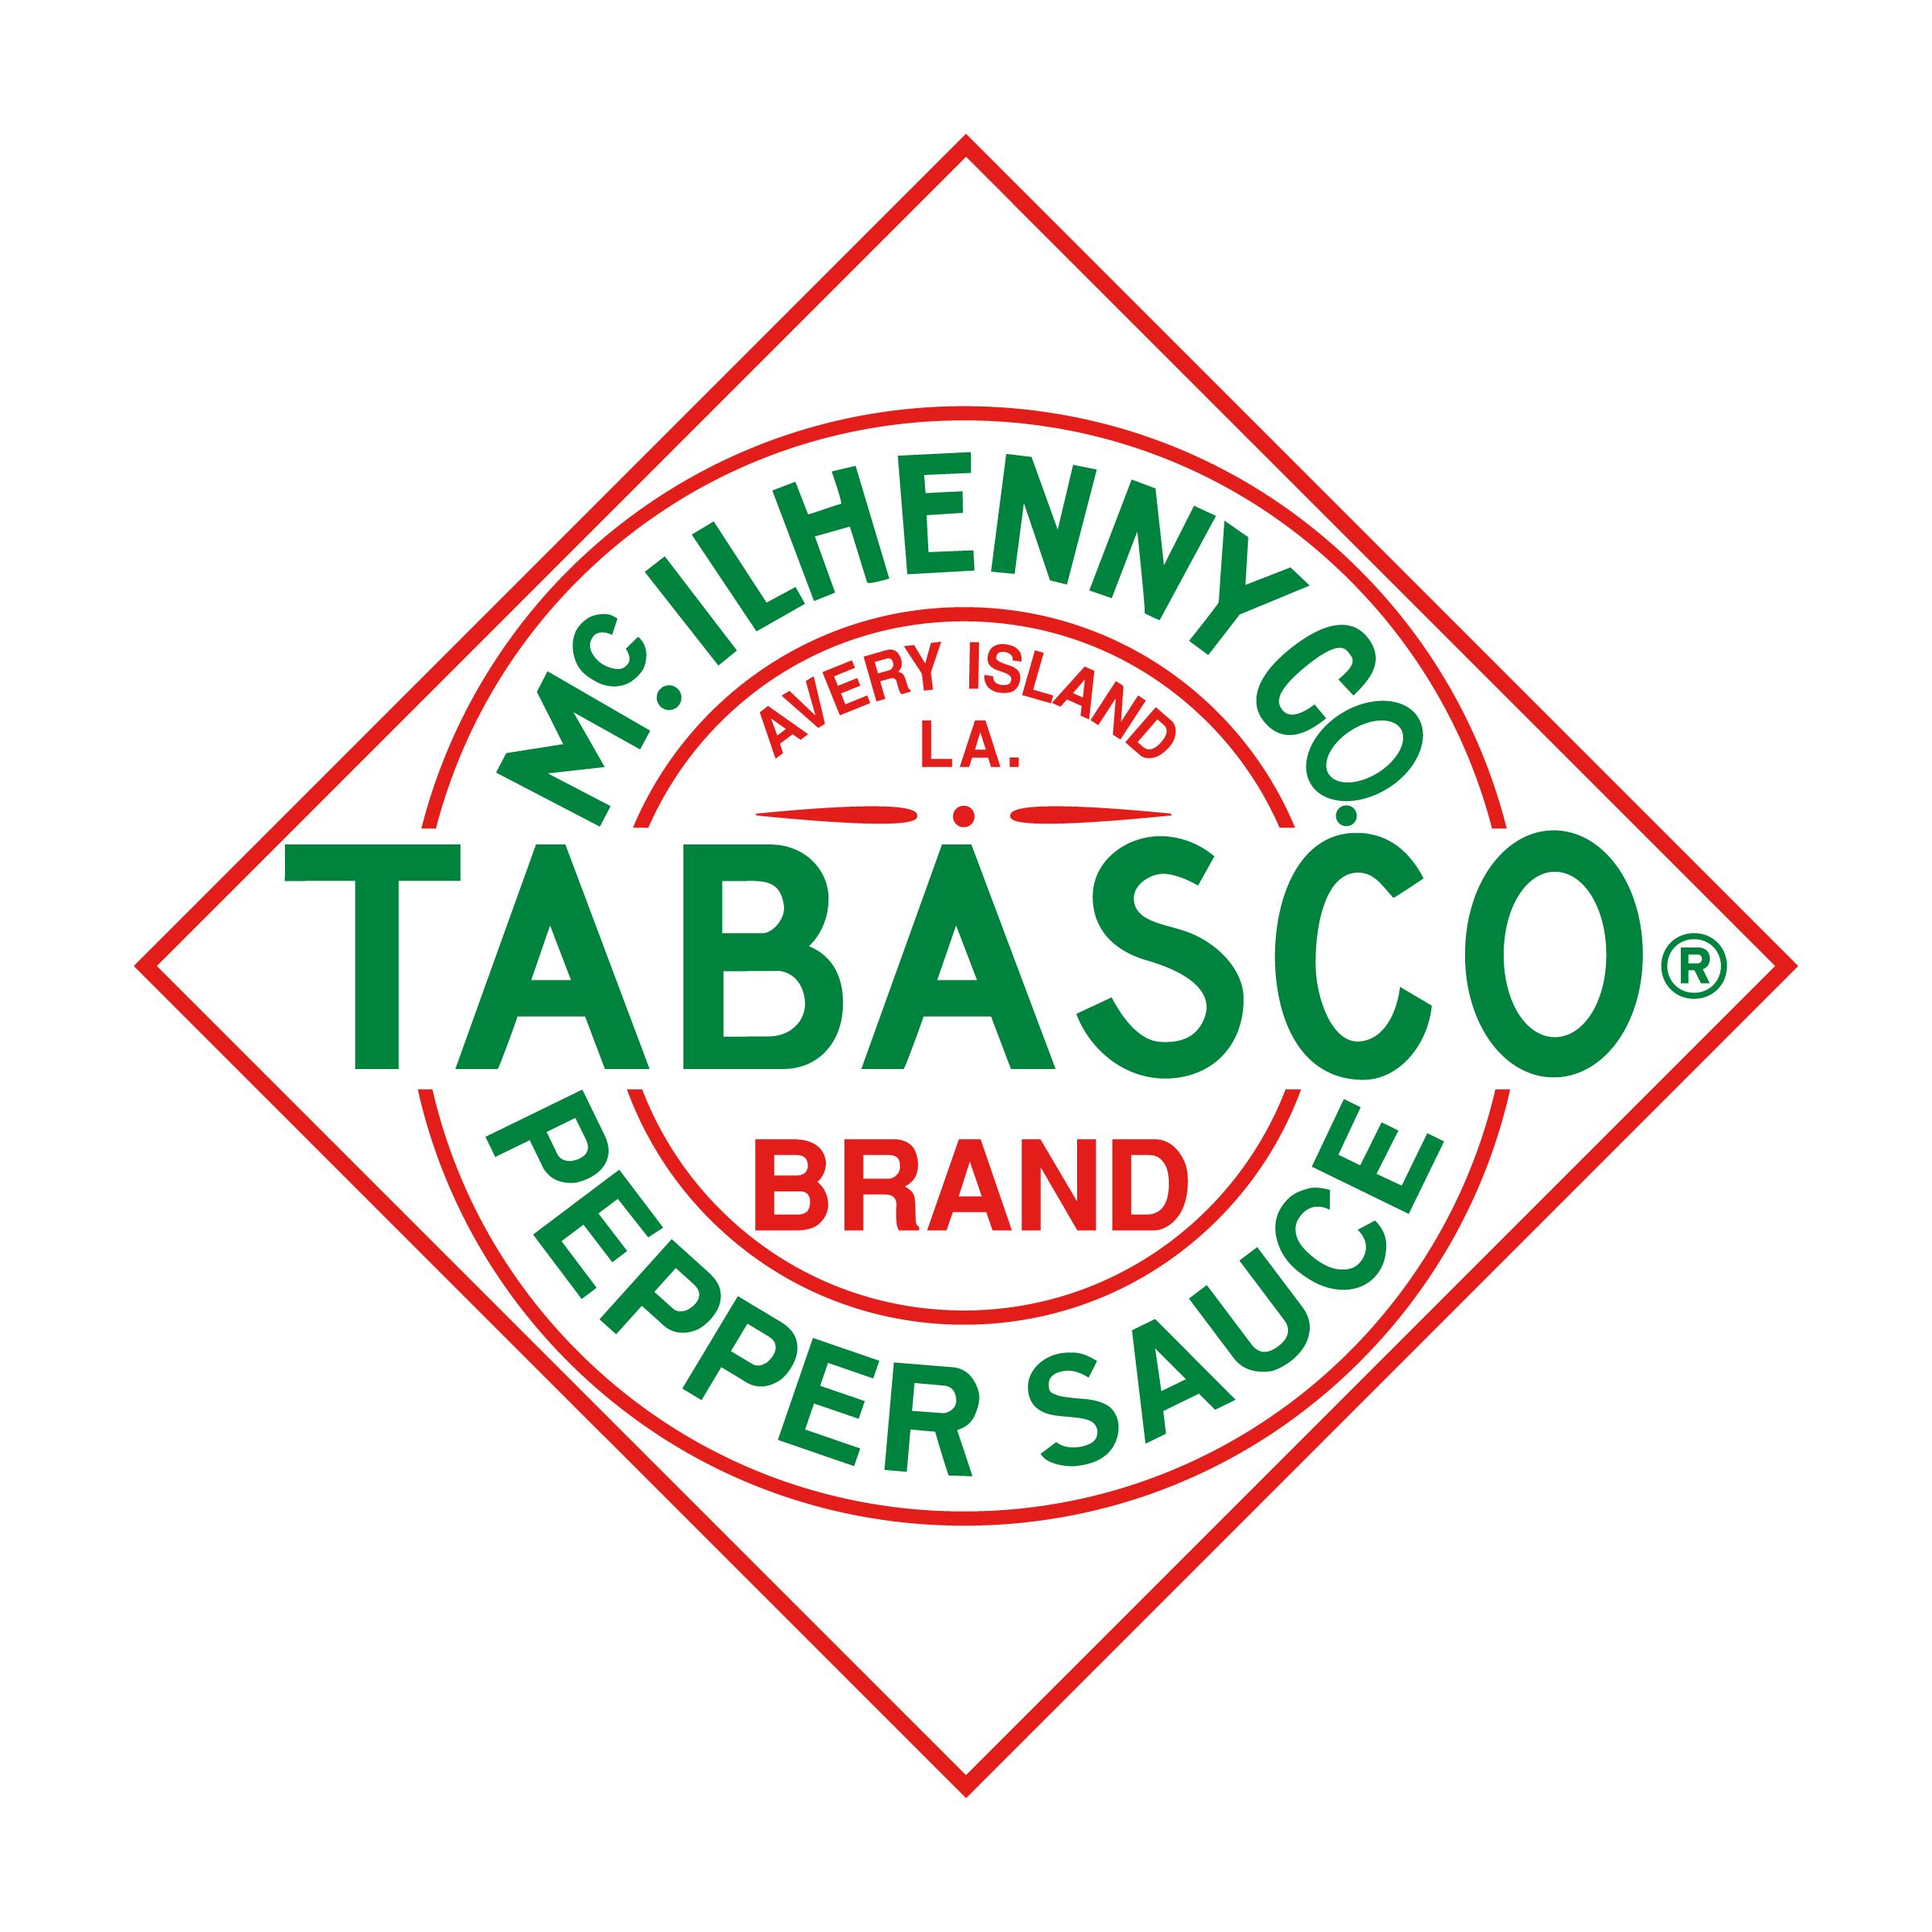 TABASCO® BRAND Sauces